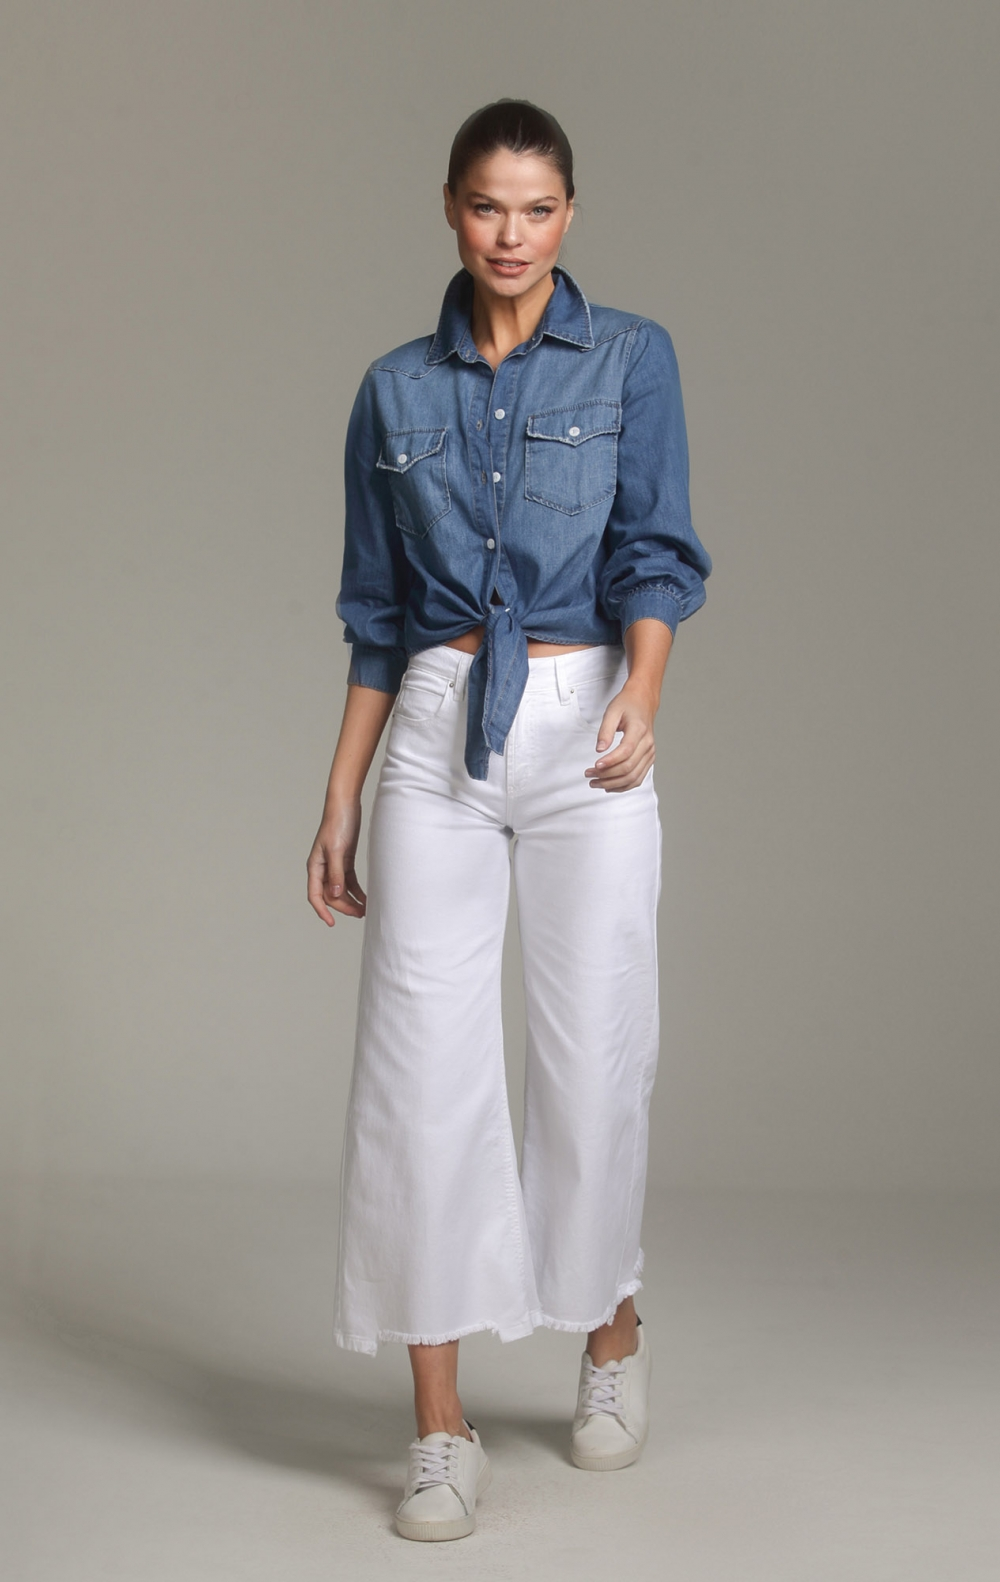 Camisa Tuca Tencel Jeans - Foto 1